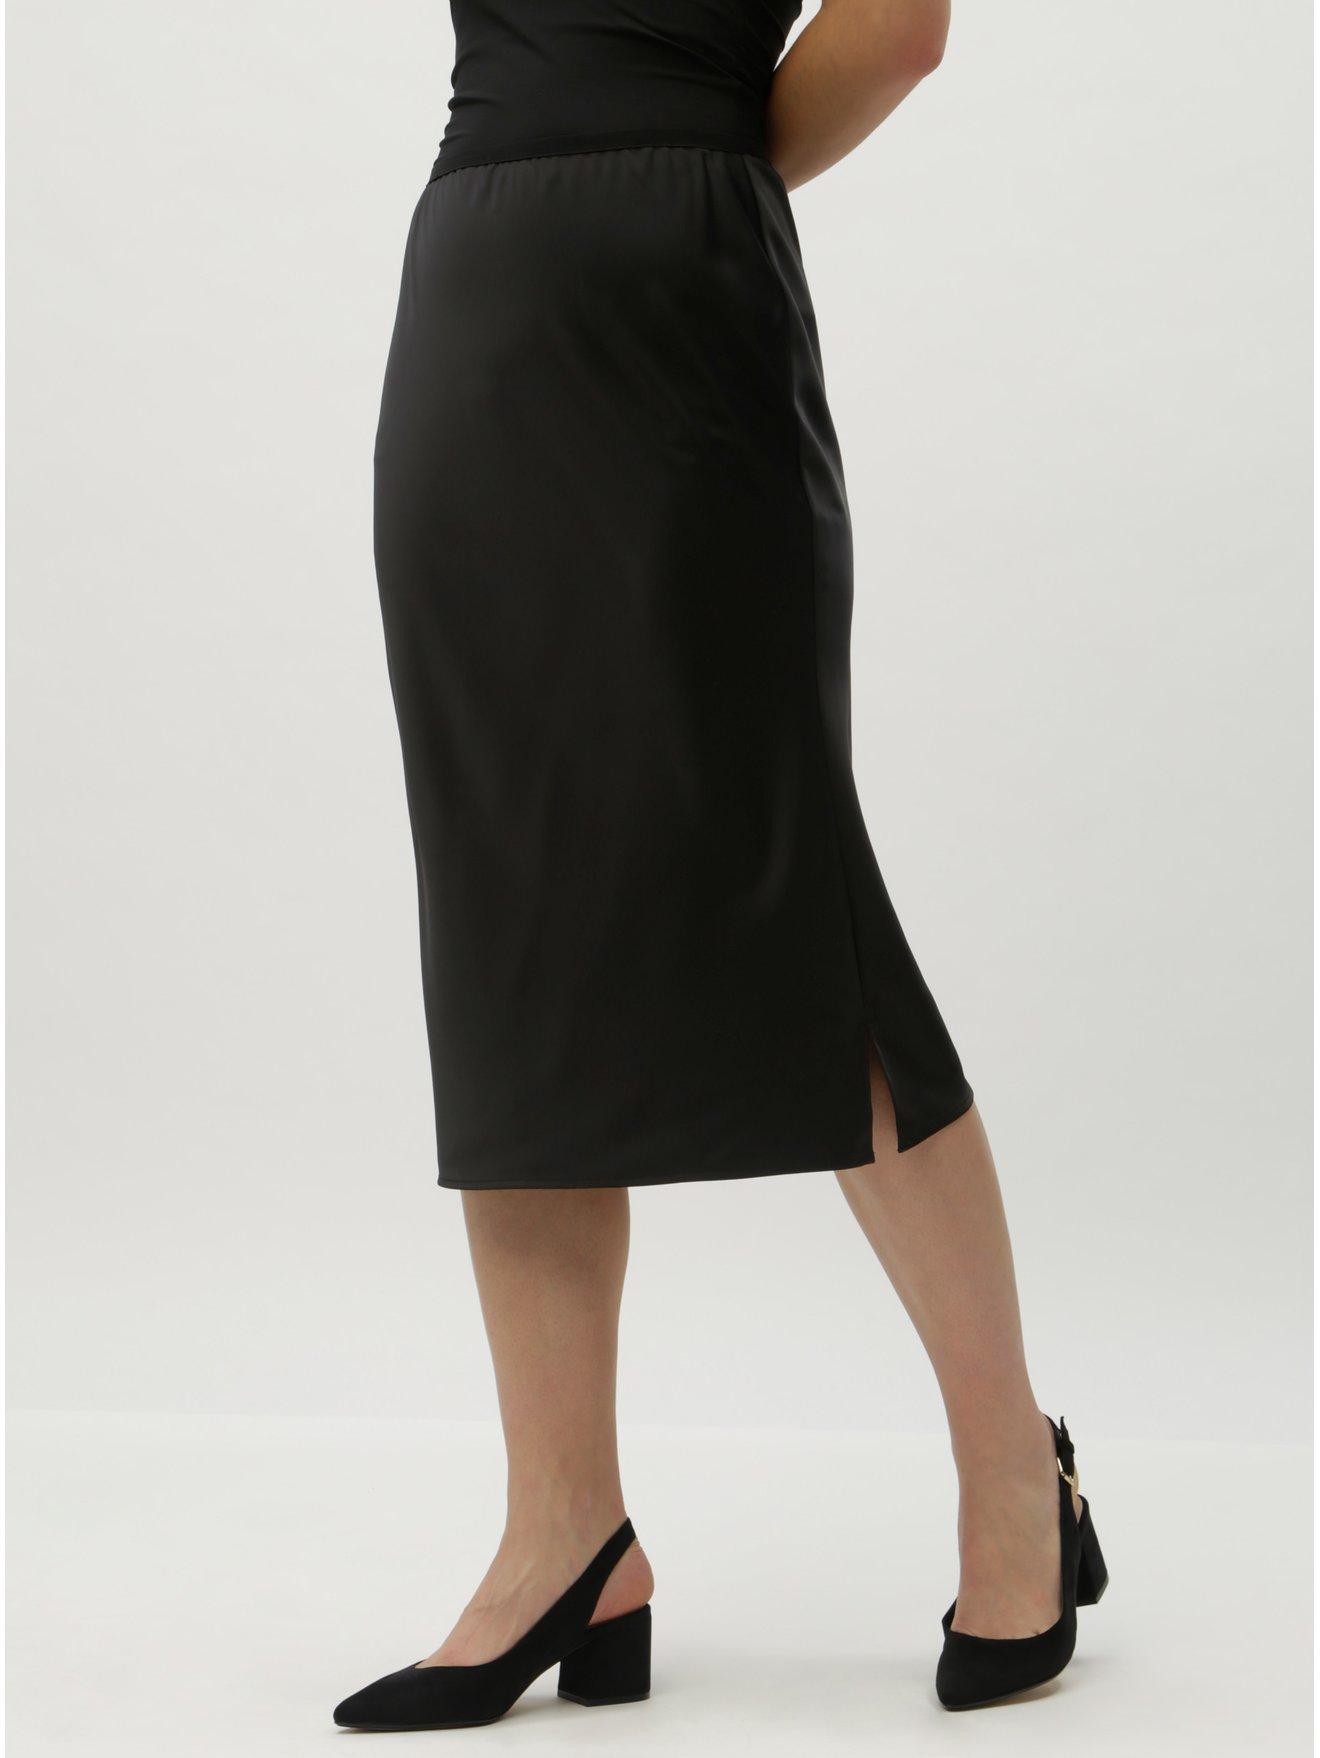 Černá sukně s gumou v pase VERO MODA AWARE Ginger